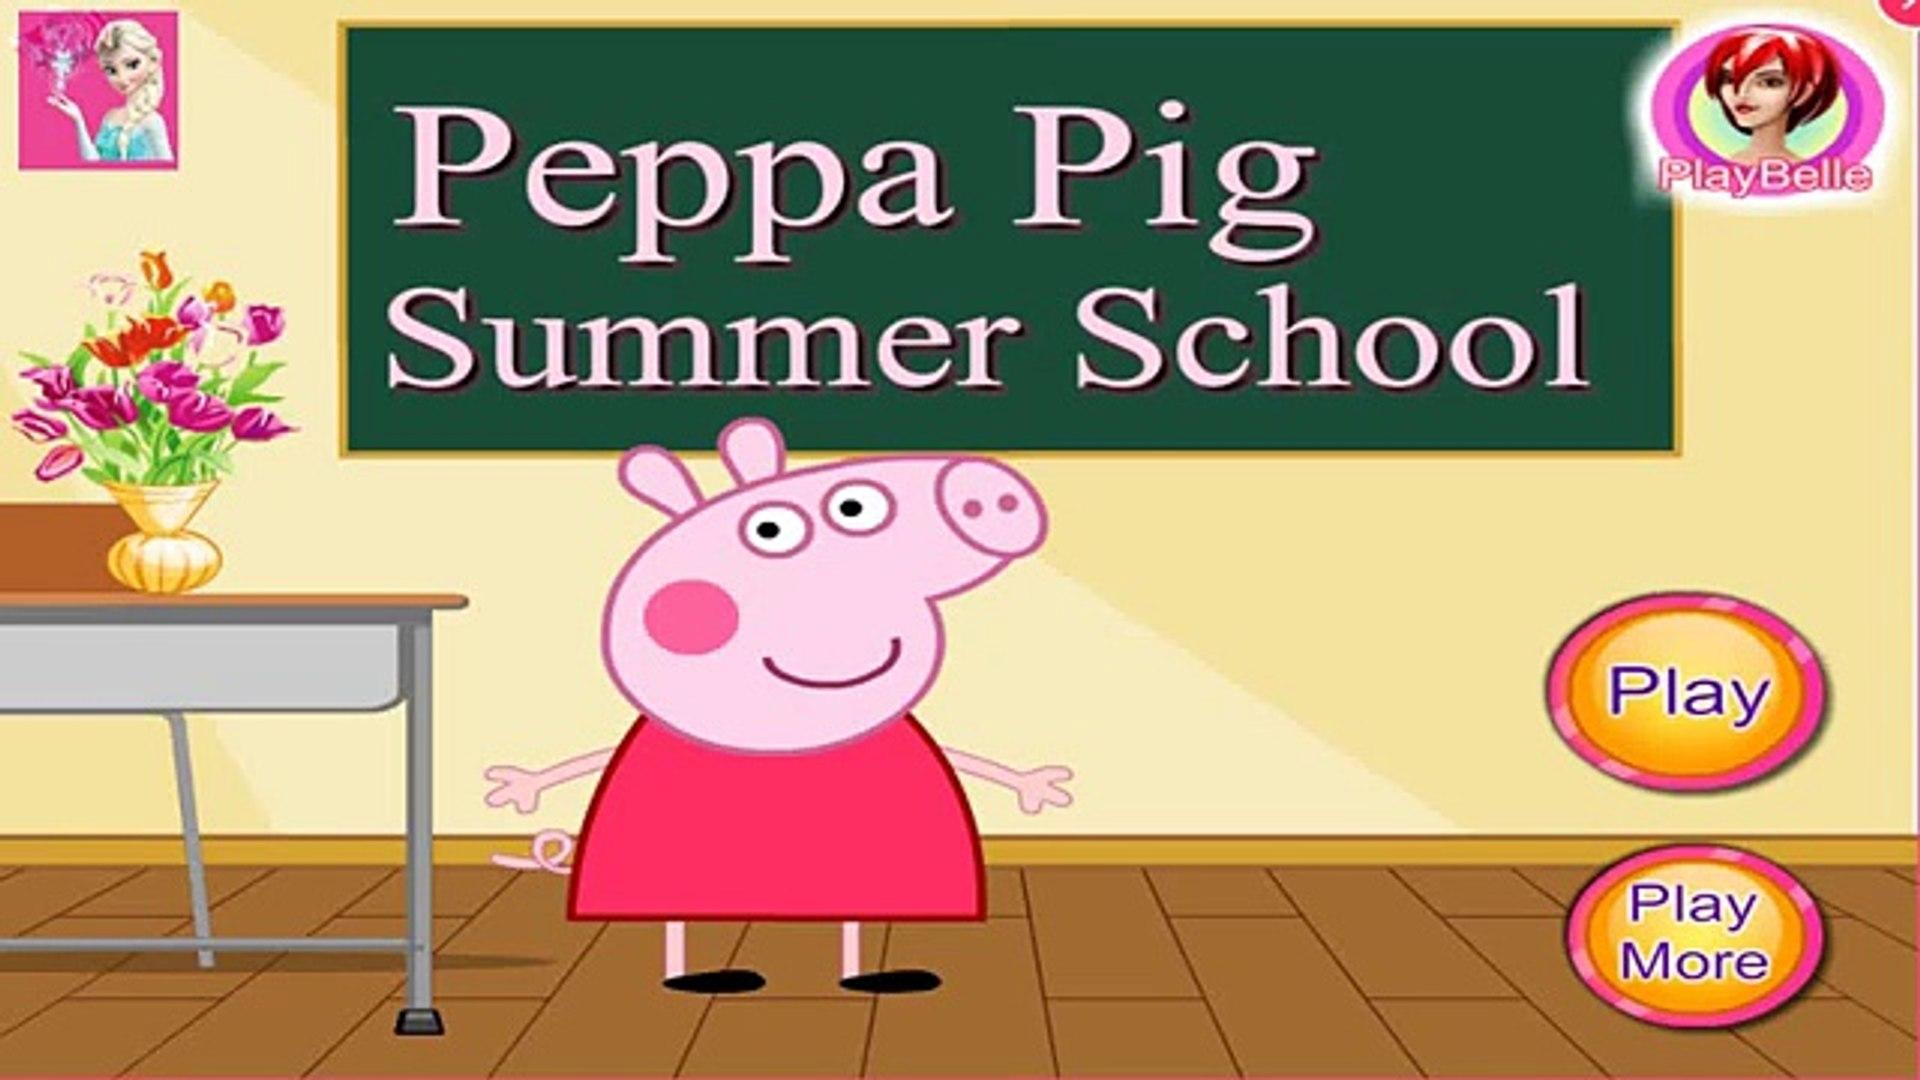 Peppa Pig Summer School | Peppa Pig Education Tools For Kids